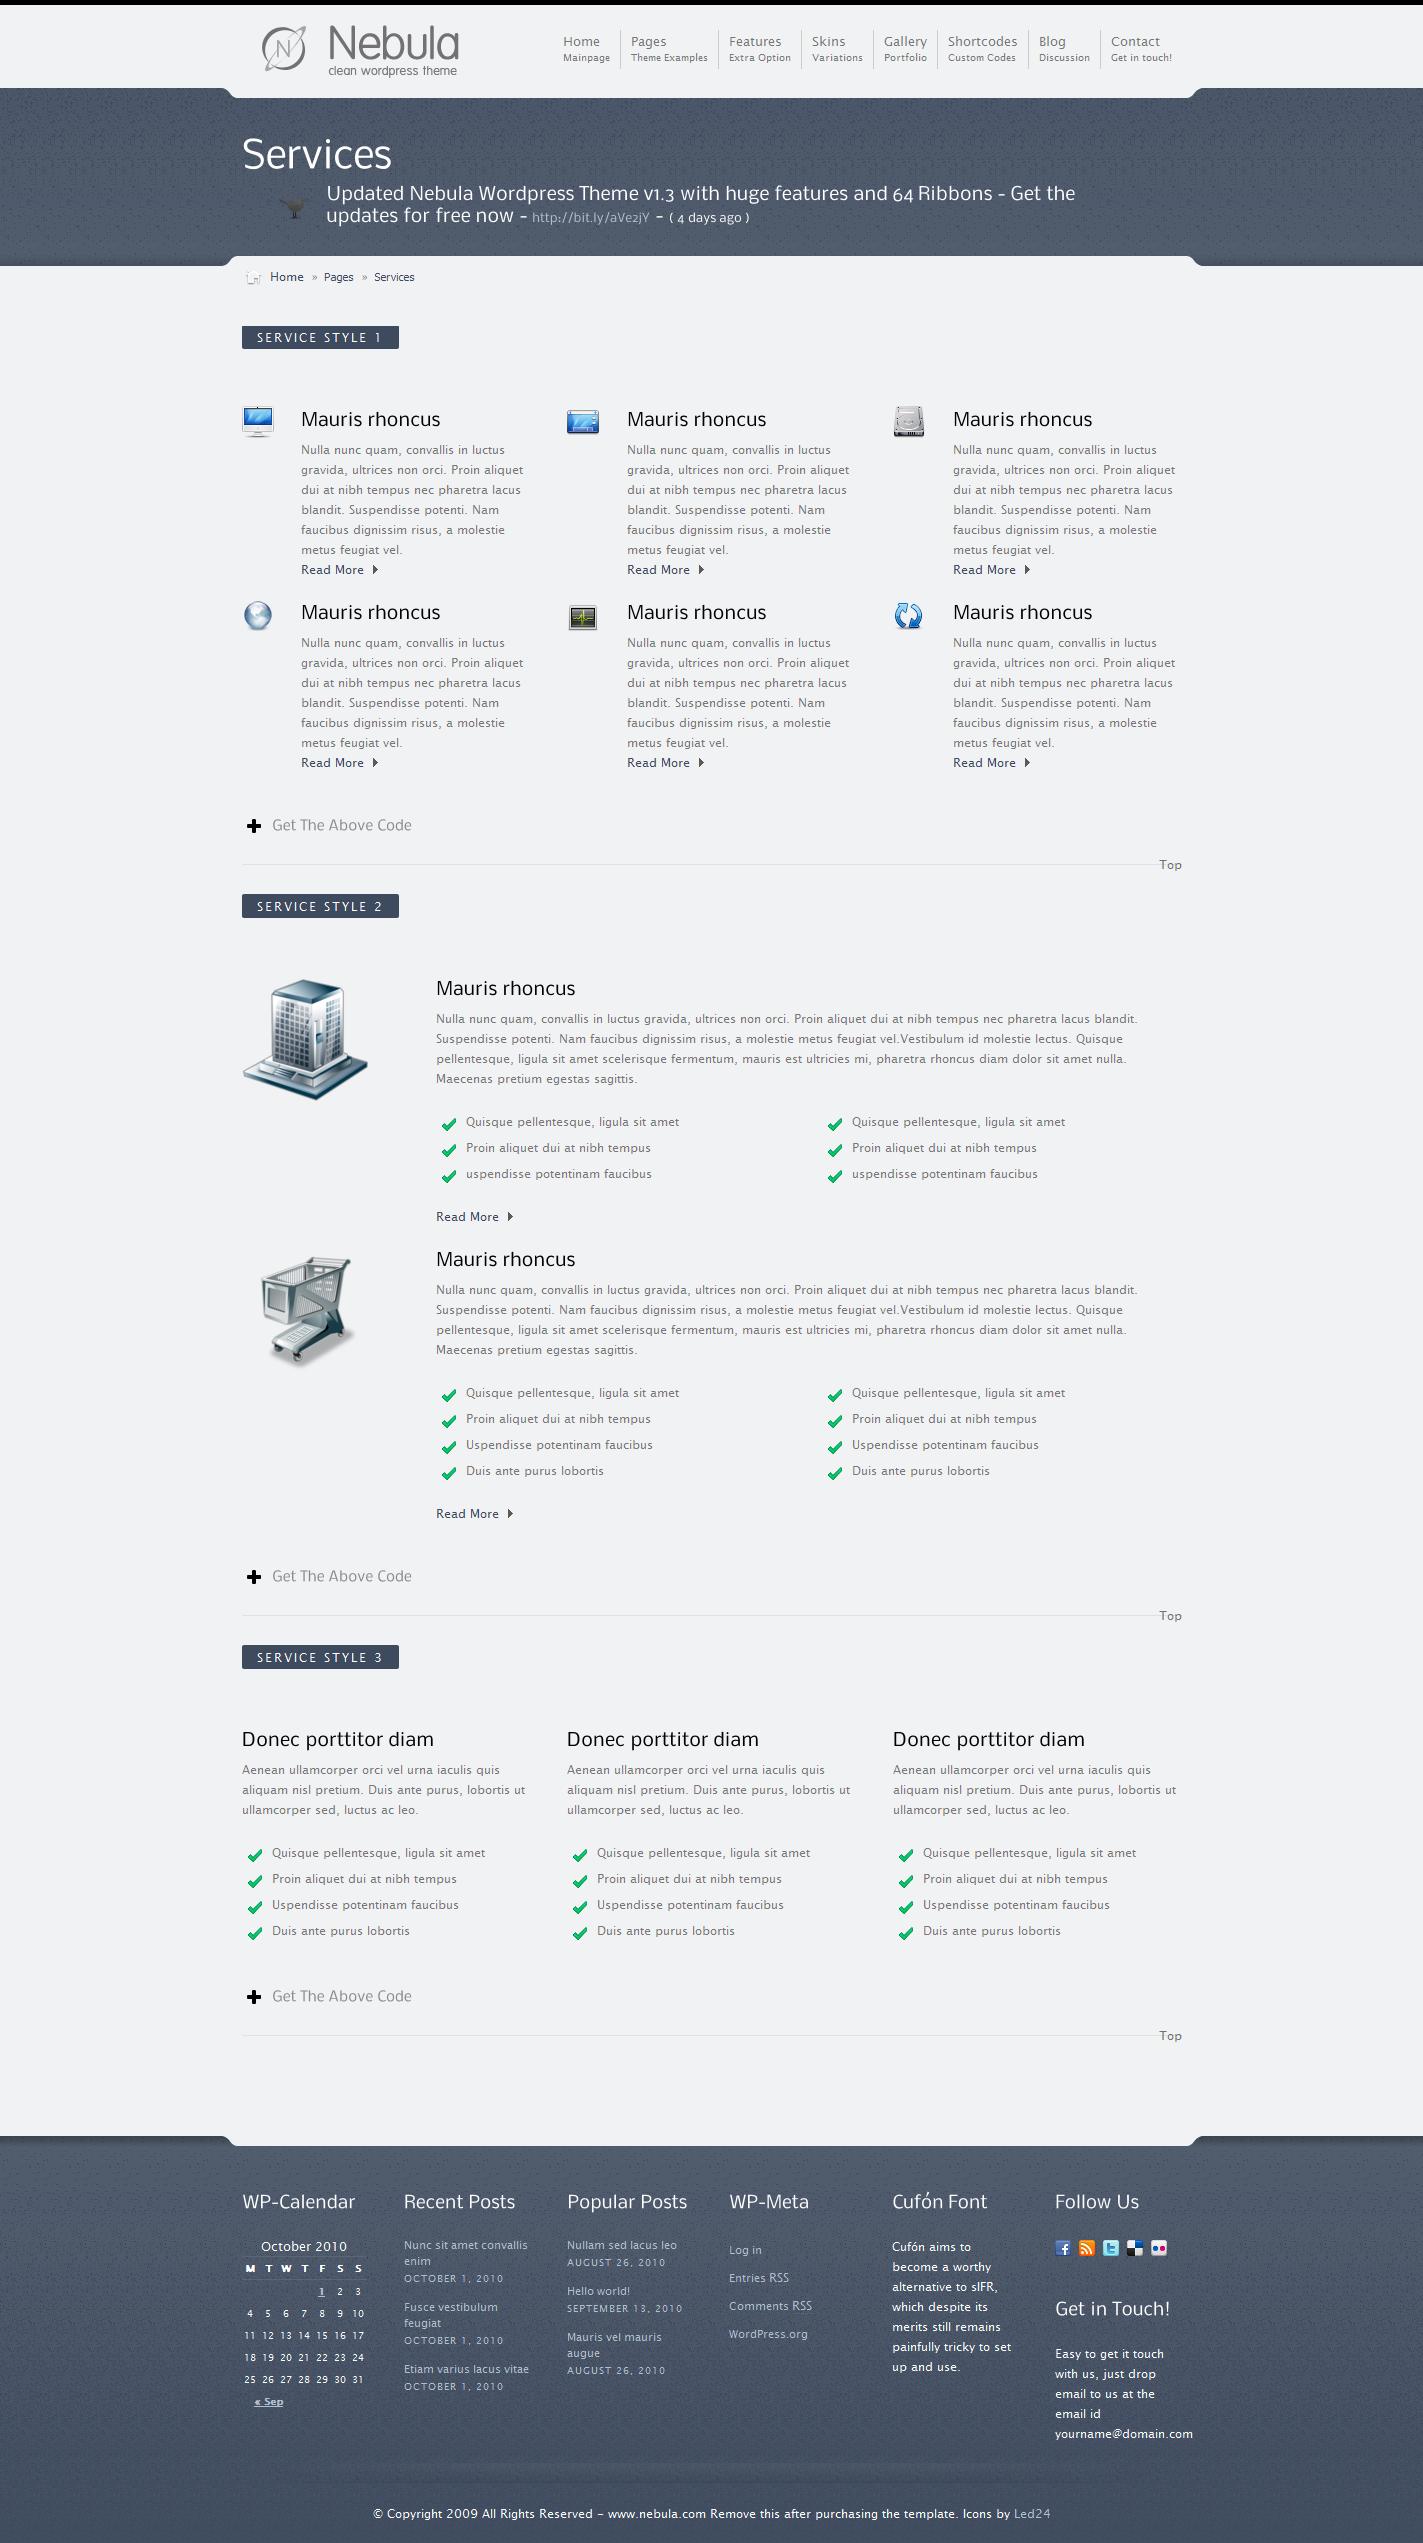 Nebula - Premium Wordpress Theme